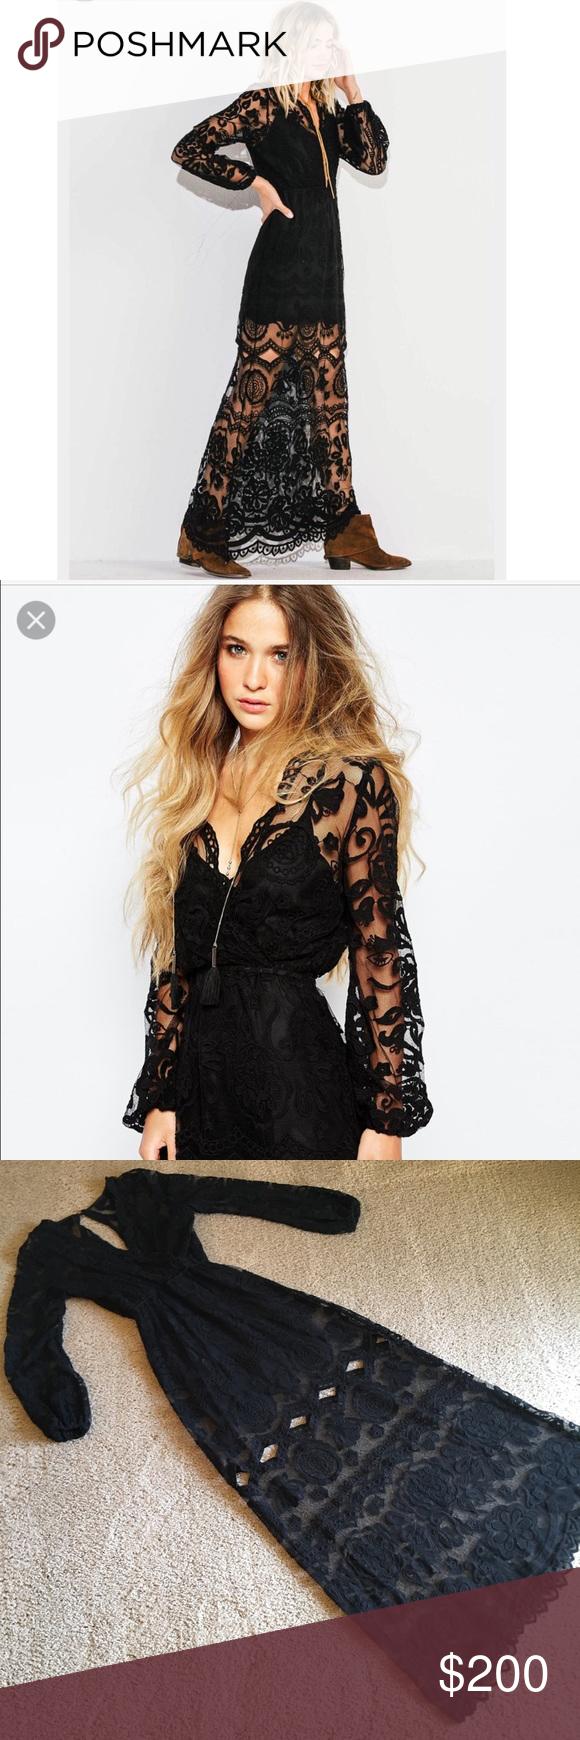 Jenus pirate booty ara maxi dress black lace sz xs black laces and